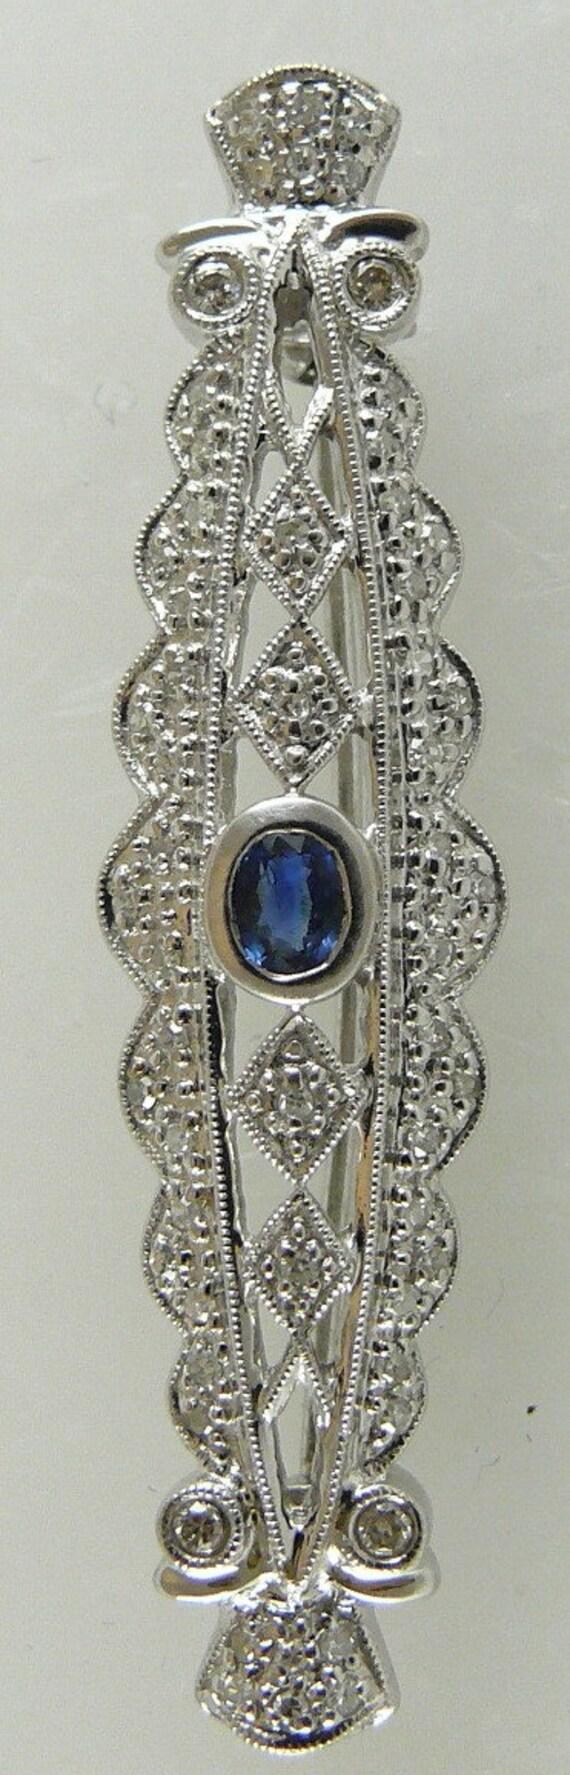 Sapphire 0.30ct Pin 18k White Gold with Diamonds 0.28ct